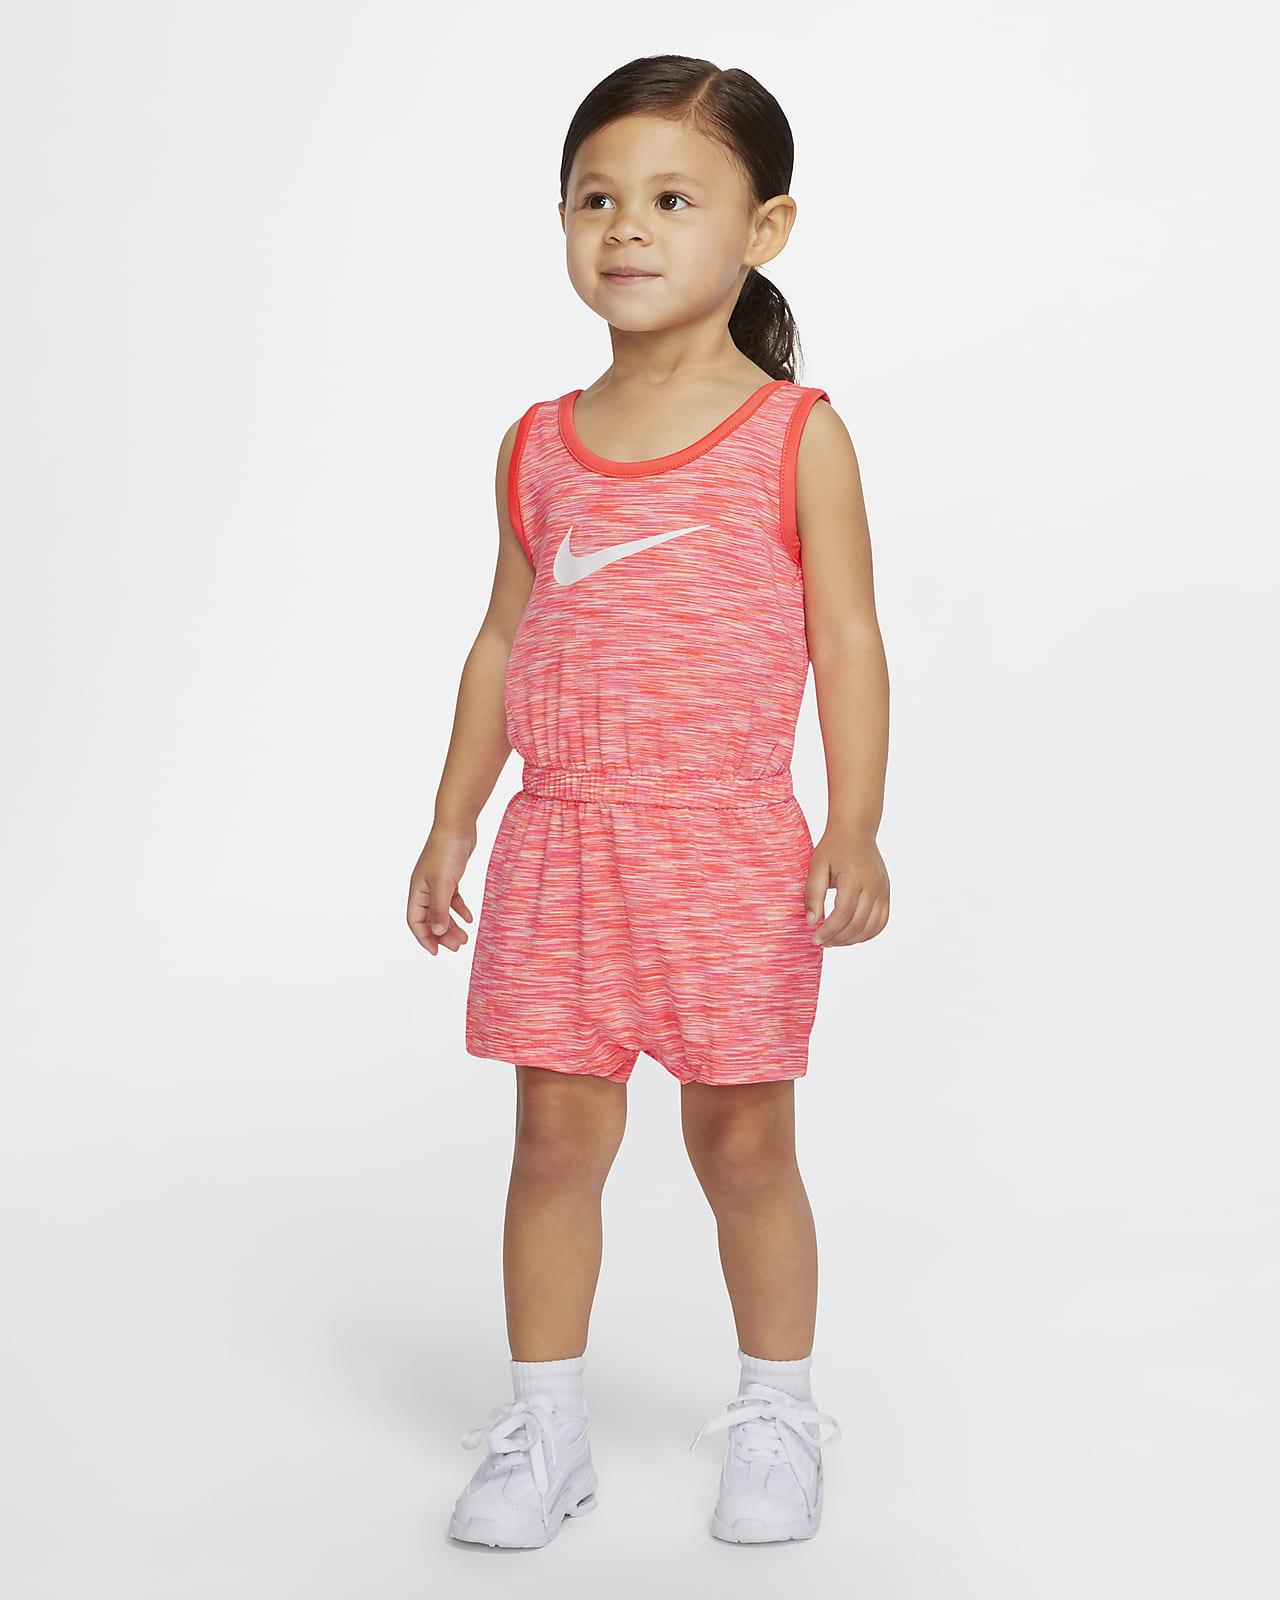 Nike Baby (12-24M) Striped Romper